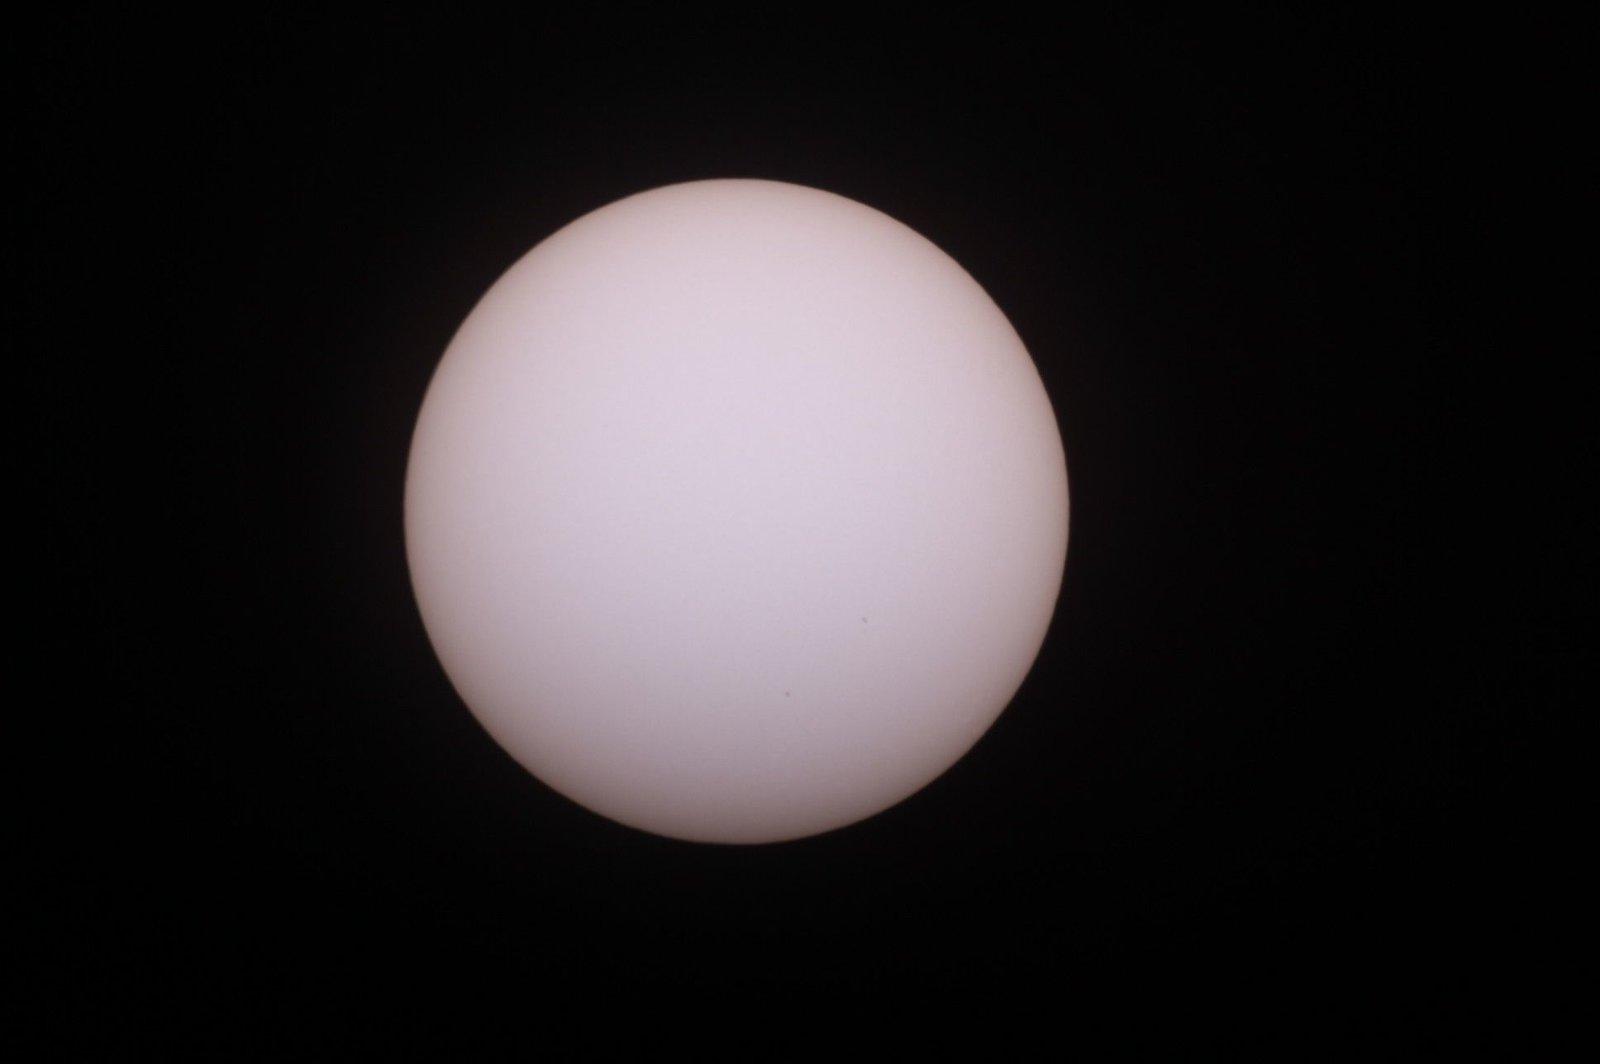 Sun_17_05.19_1313.thumb.jpg.e9394bf9af45874c662852241ac6793c.jpg